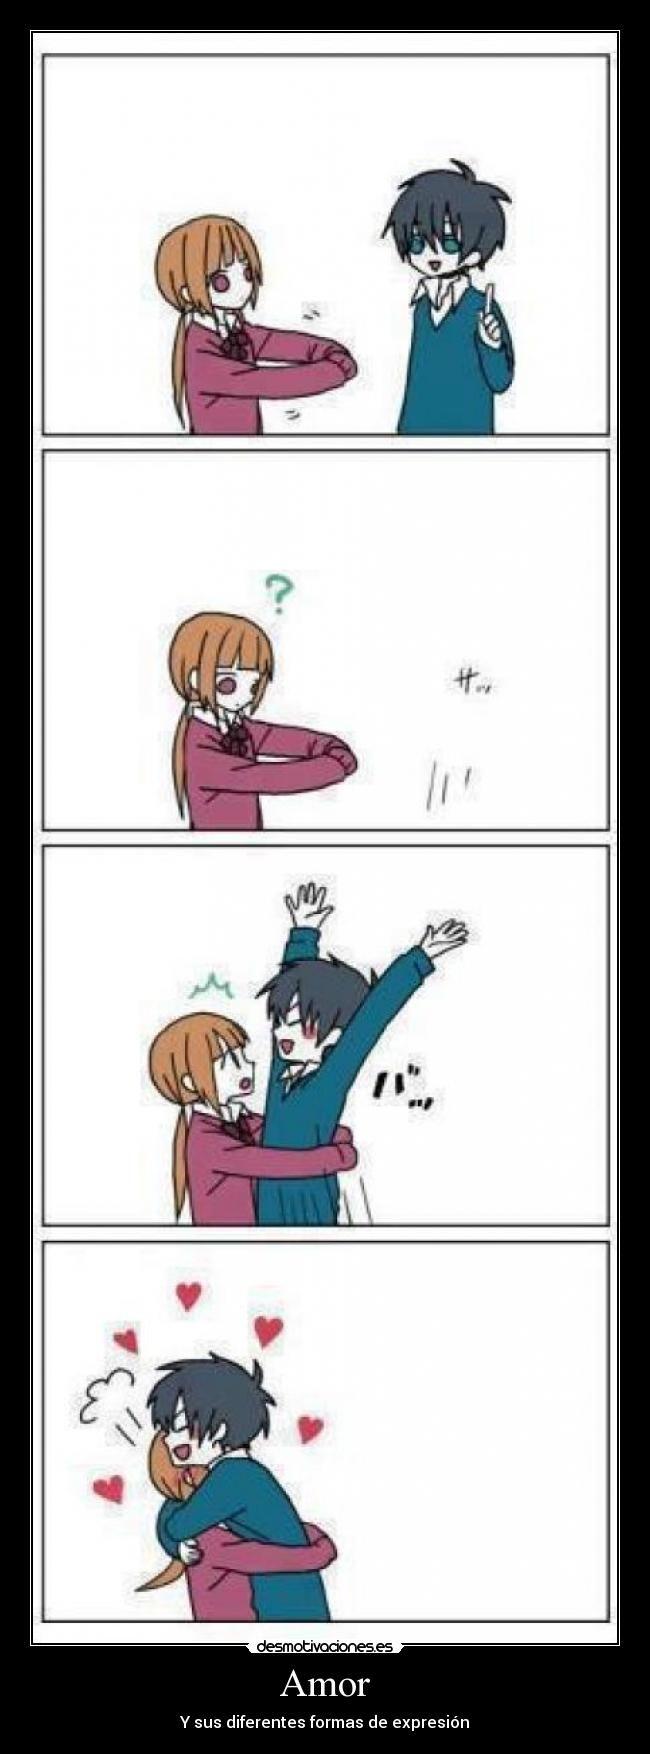 carteles amor amor love grrr beellamy hoy anime tonari kaibutsu dia abrazo jajaja awww desmotivaciones